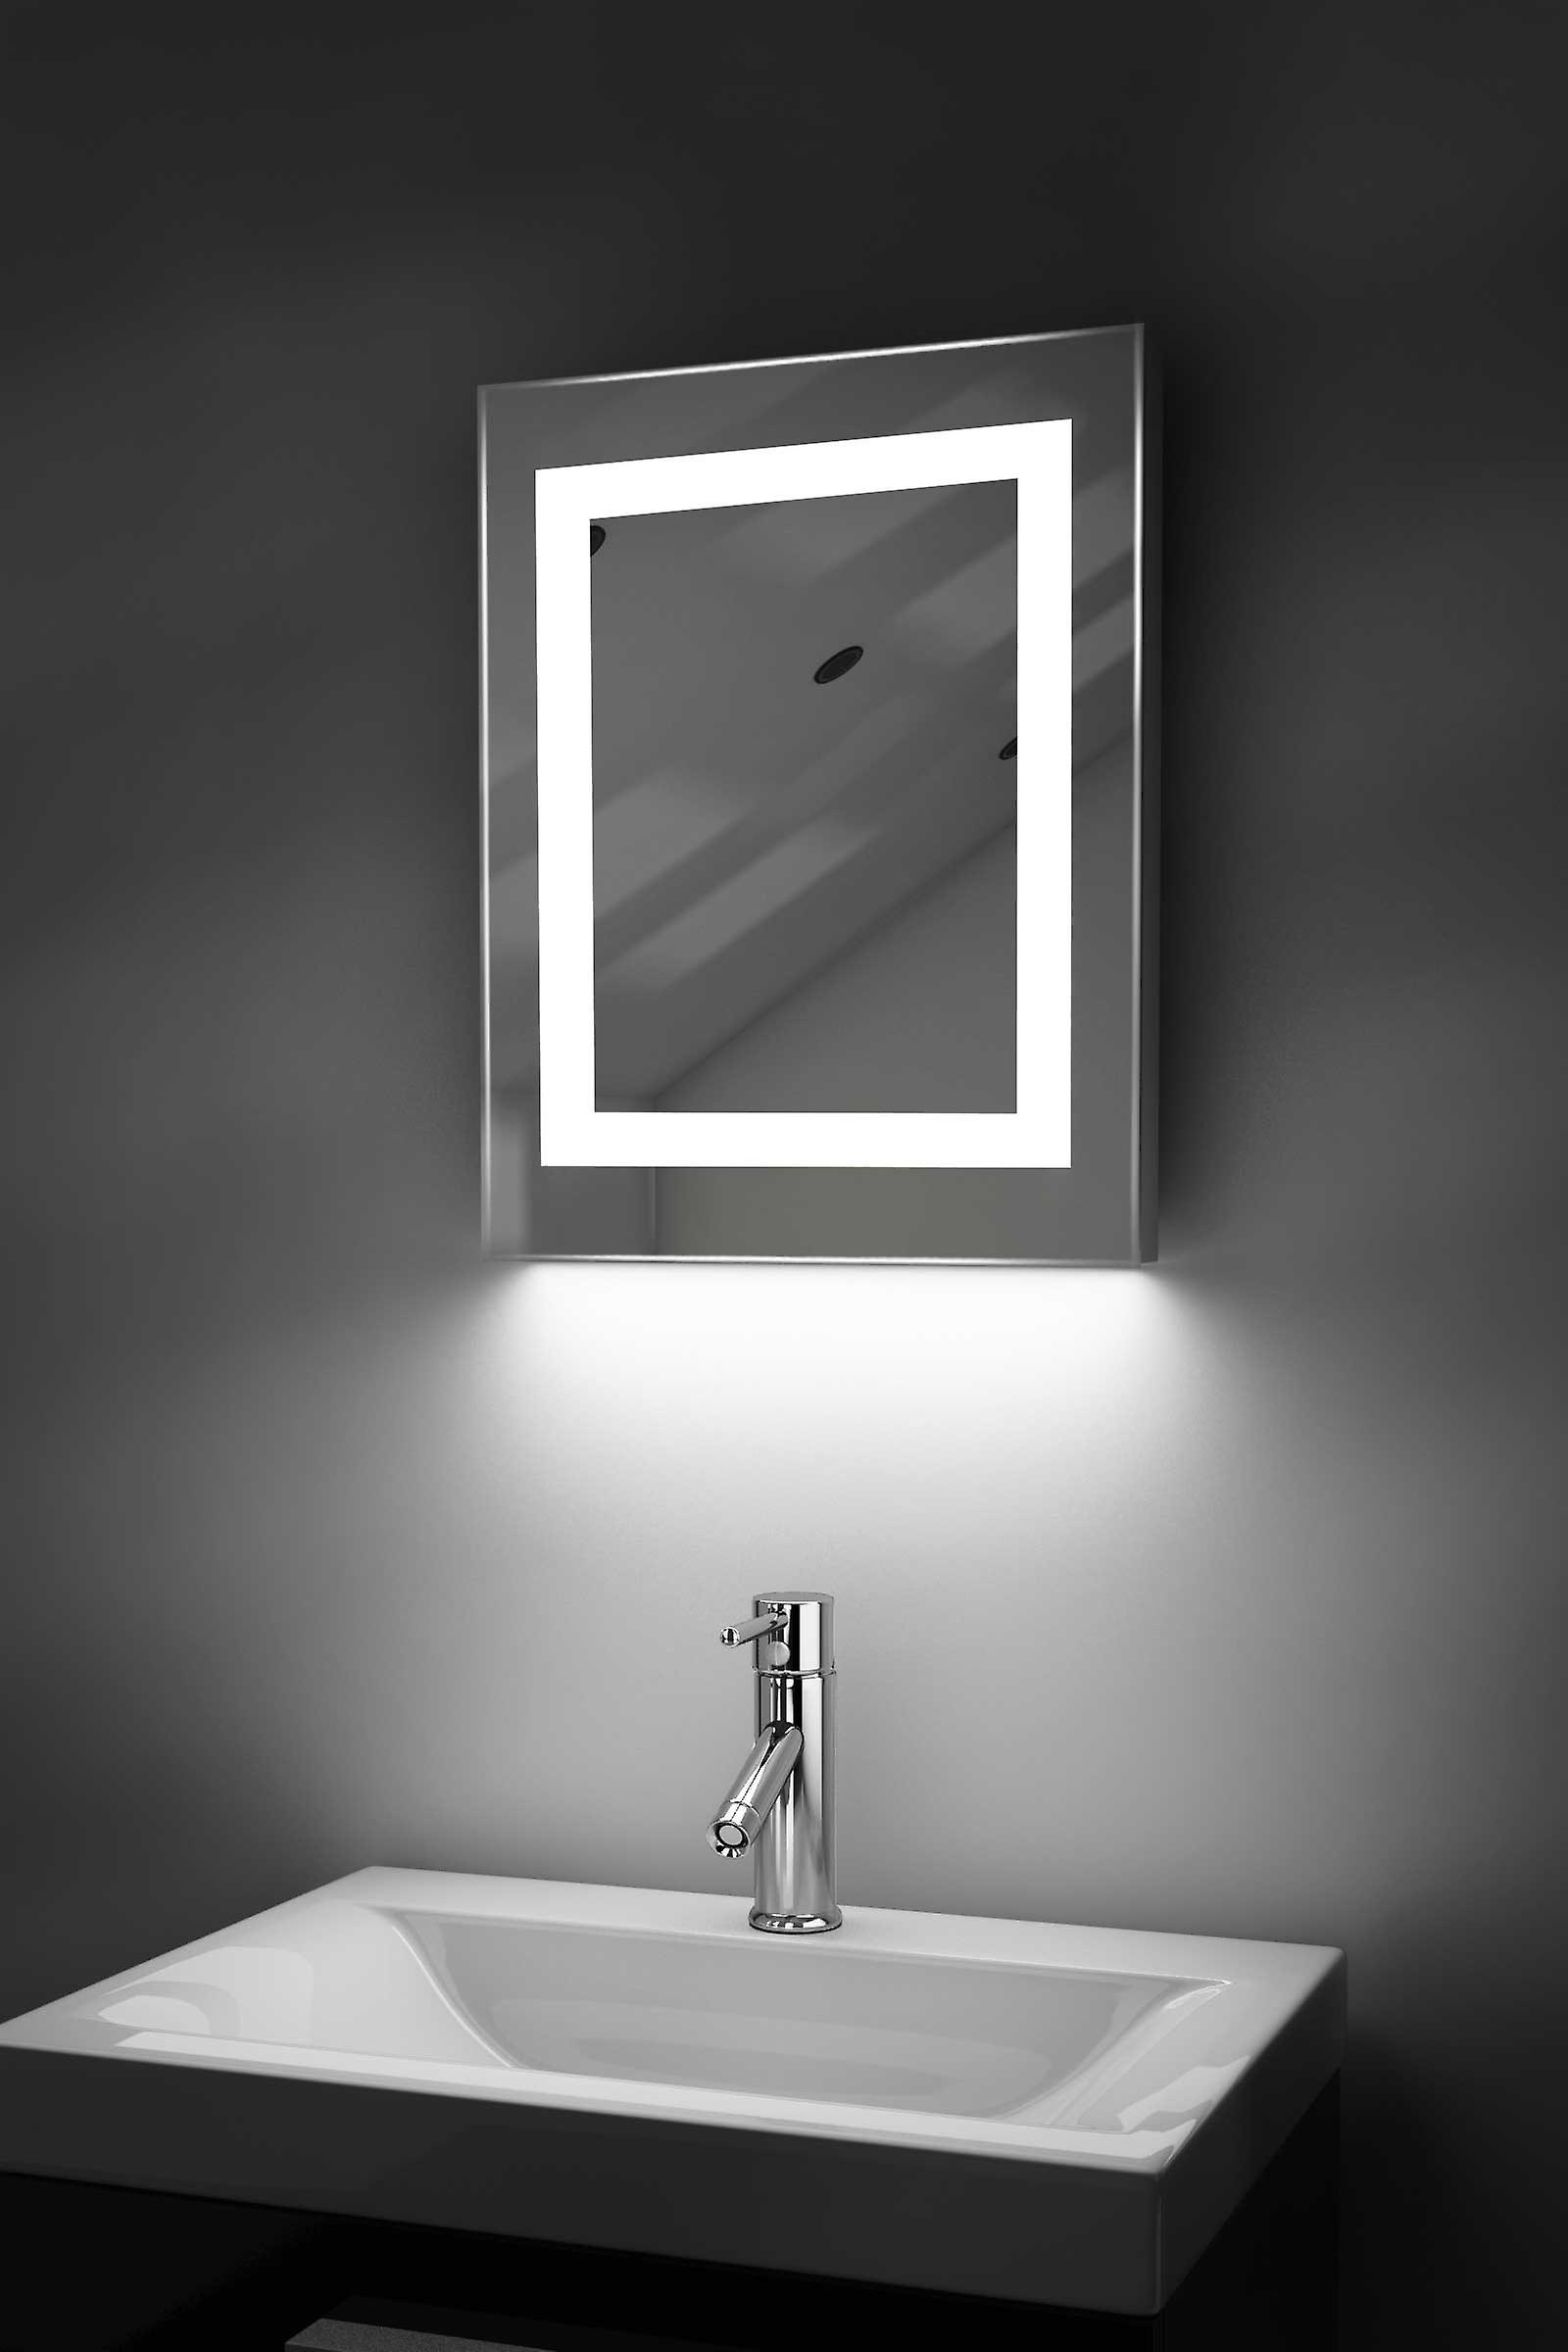 Ambient Shaver LED Bathroom Mirror With Demister Pad & Sensor k157iw